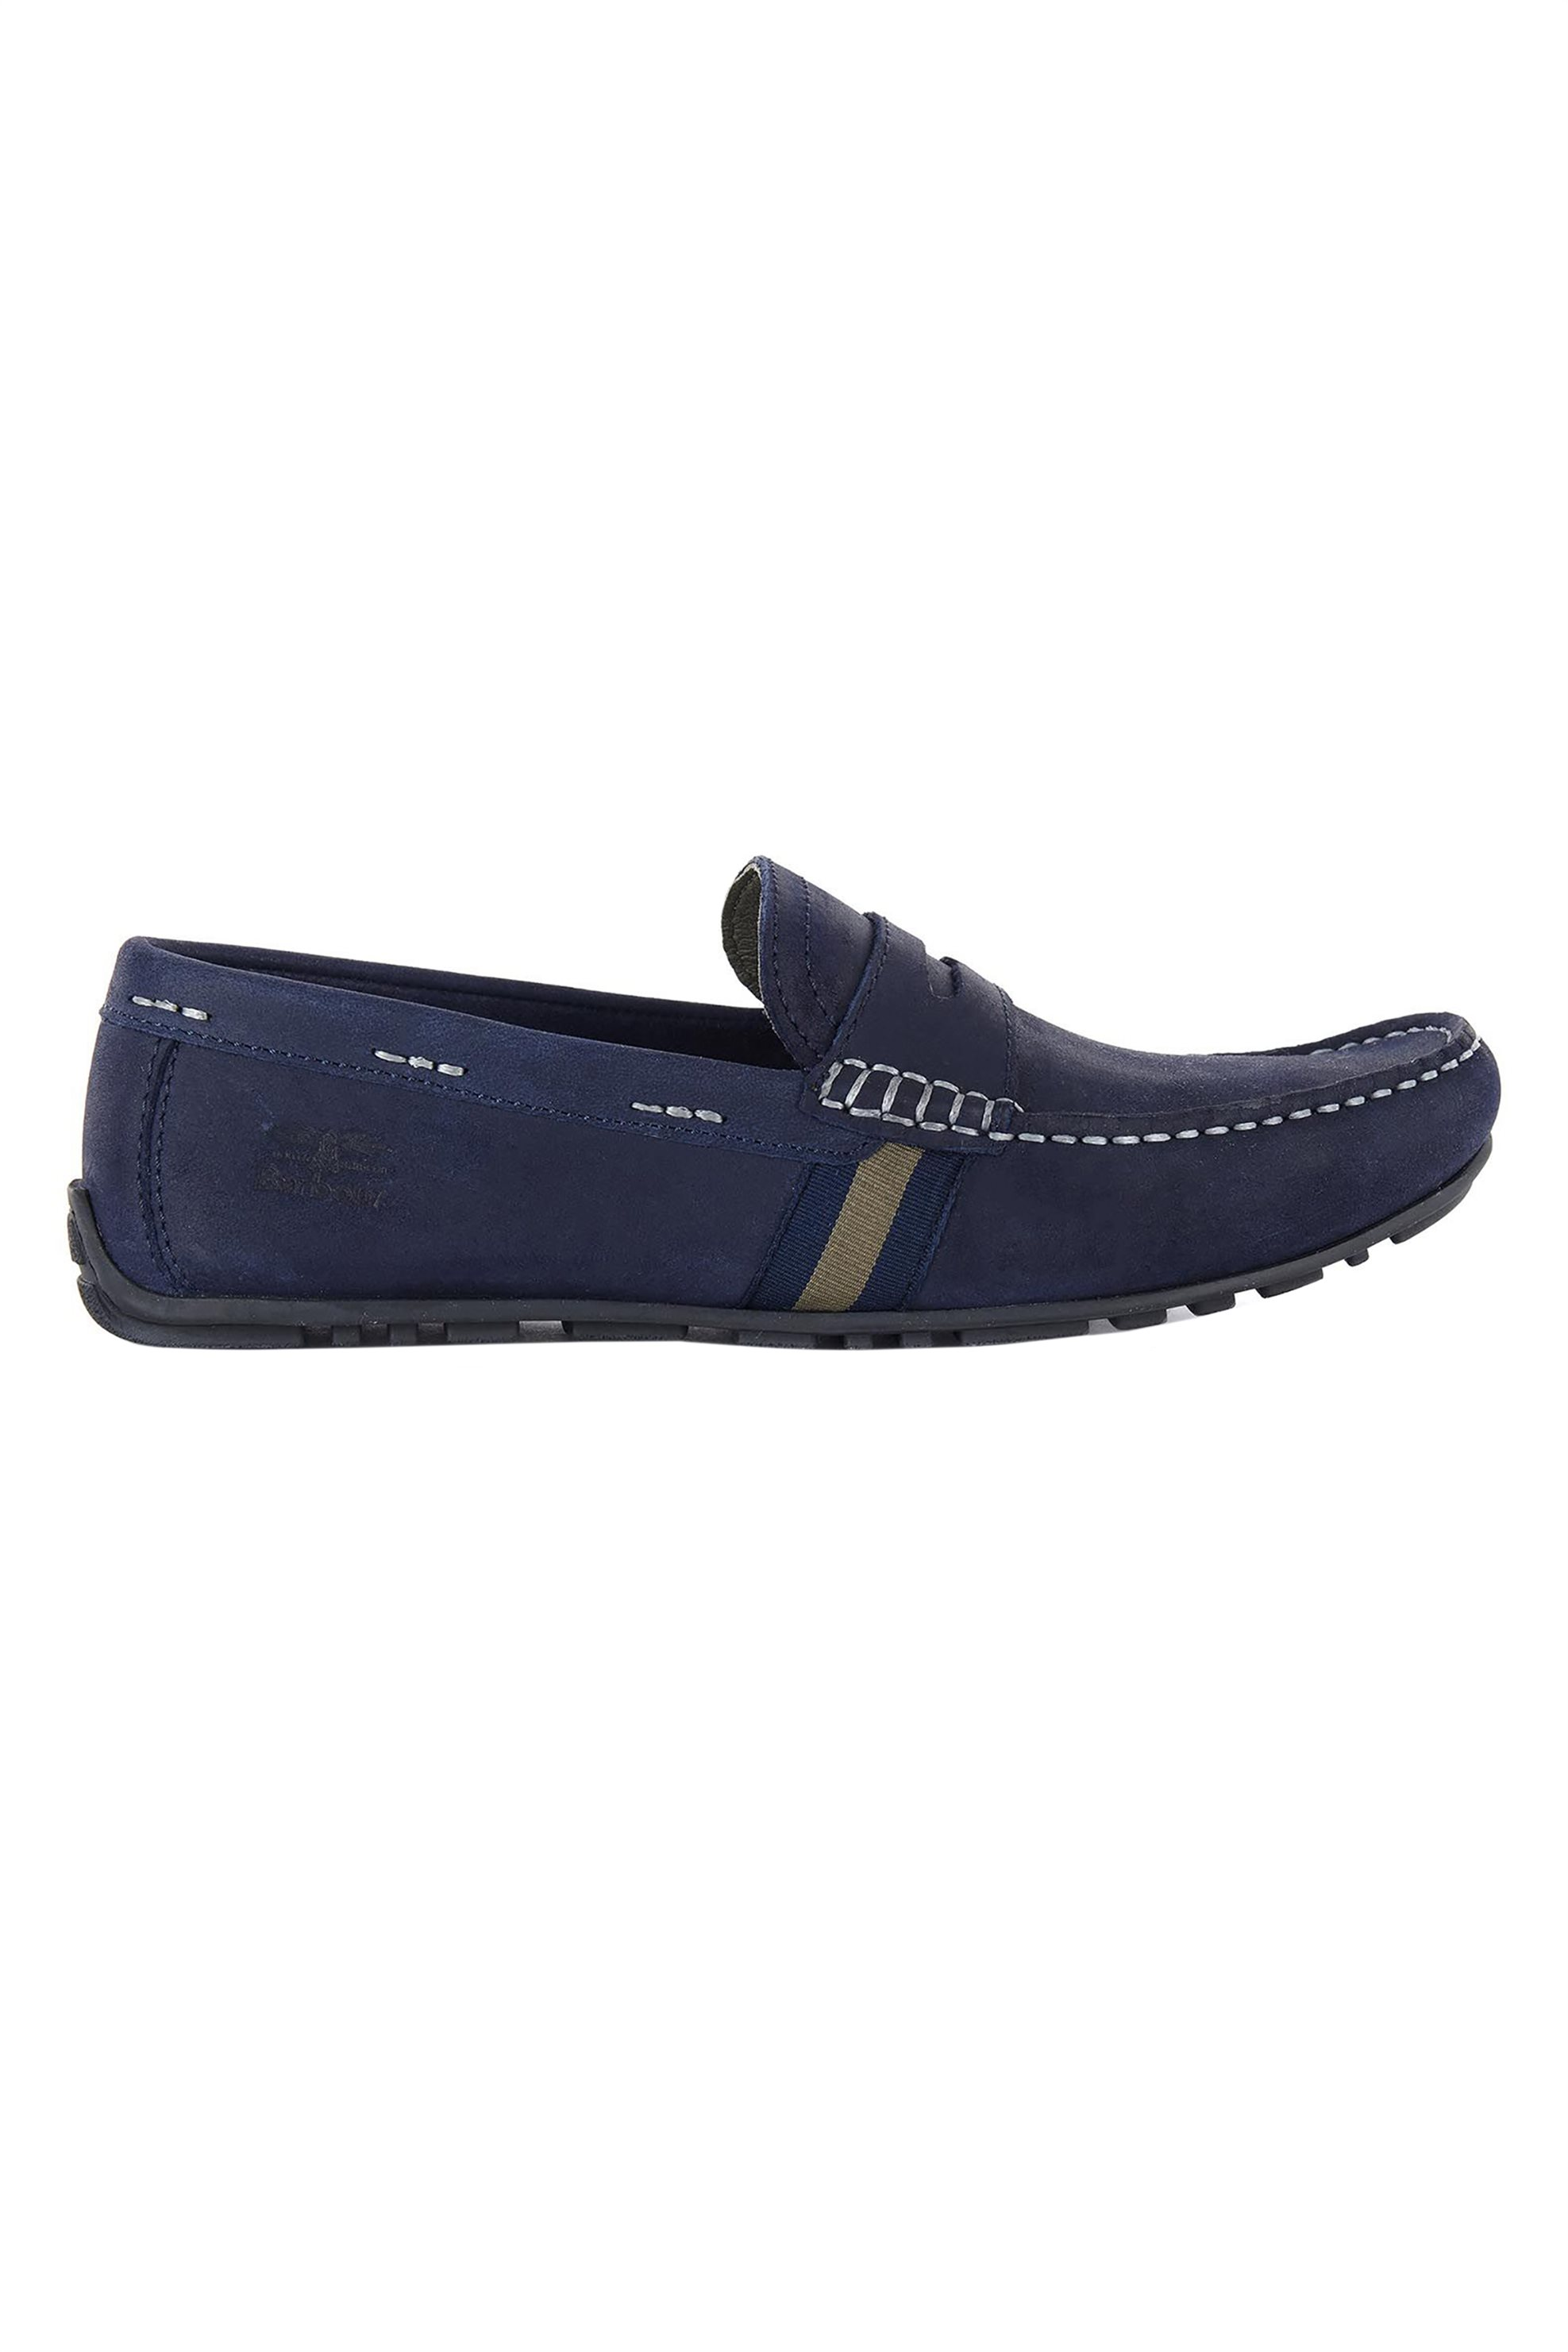 "Barbour ανδρικά loafers με ανάγλυφο λογότυπο ""Moss"" – MFO0531 – Μπλε Σκούρο"